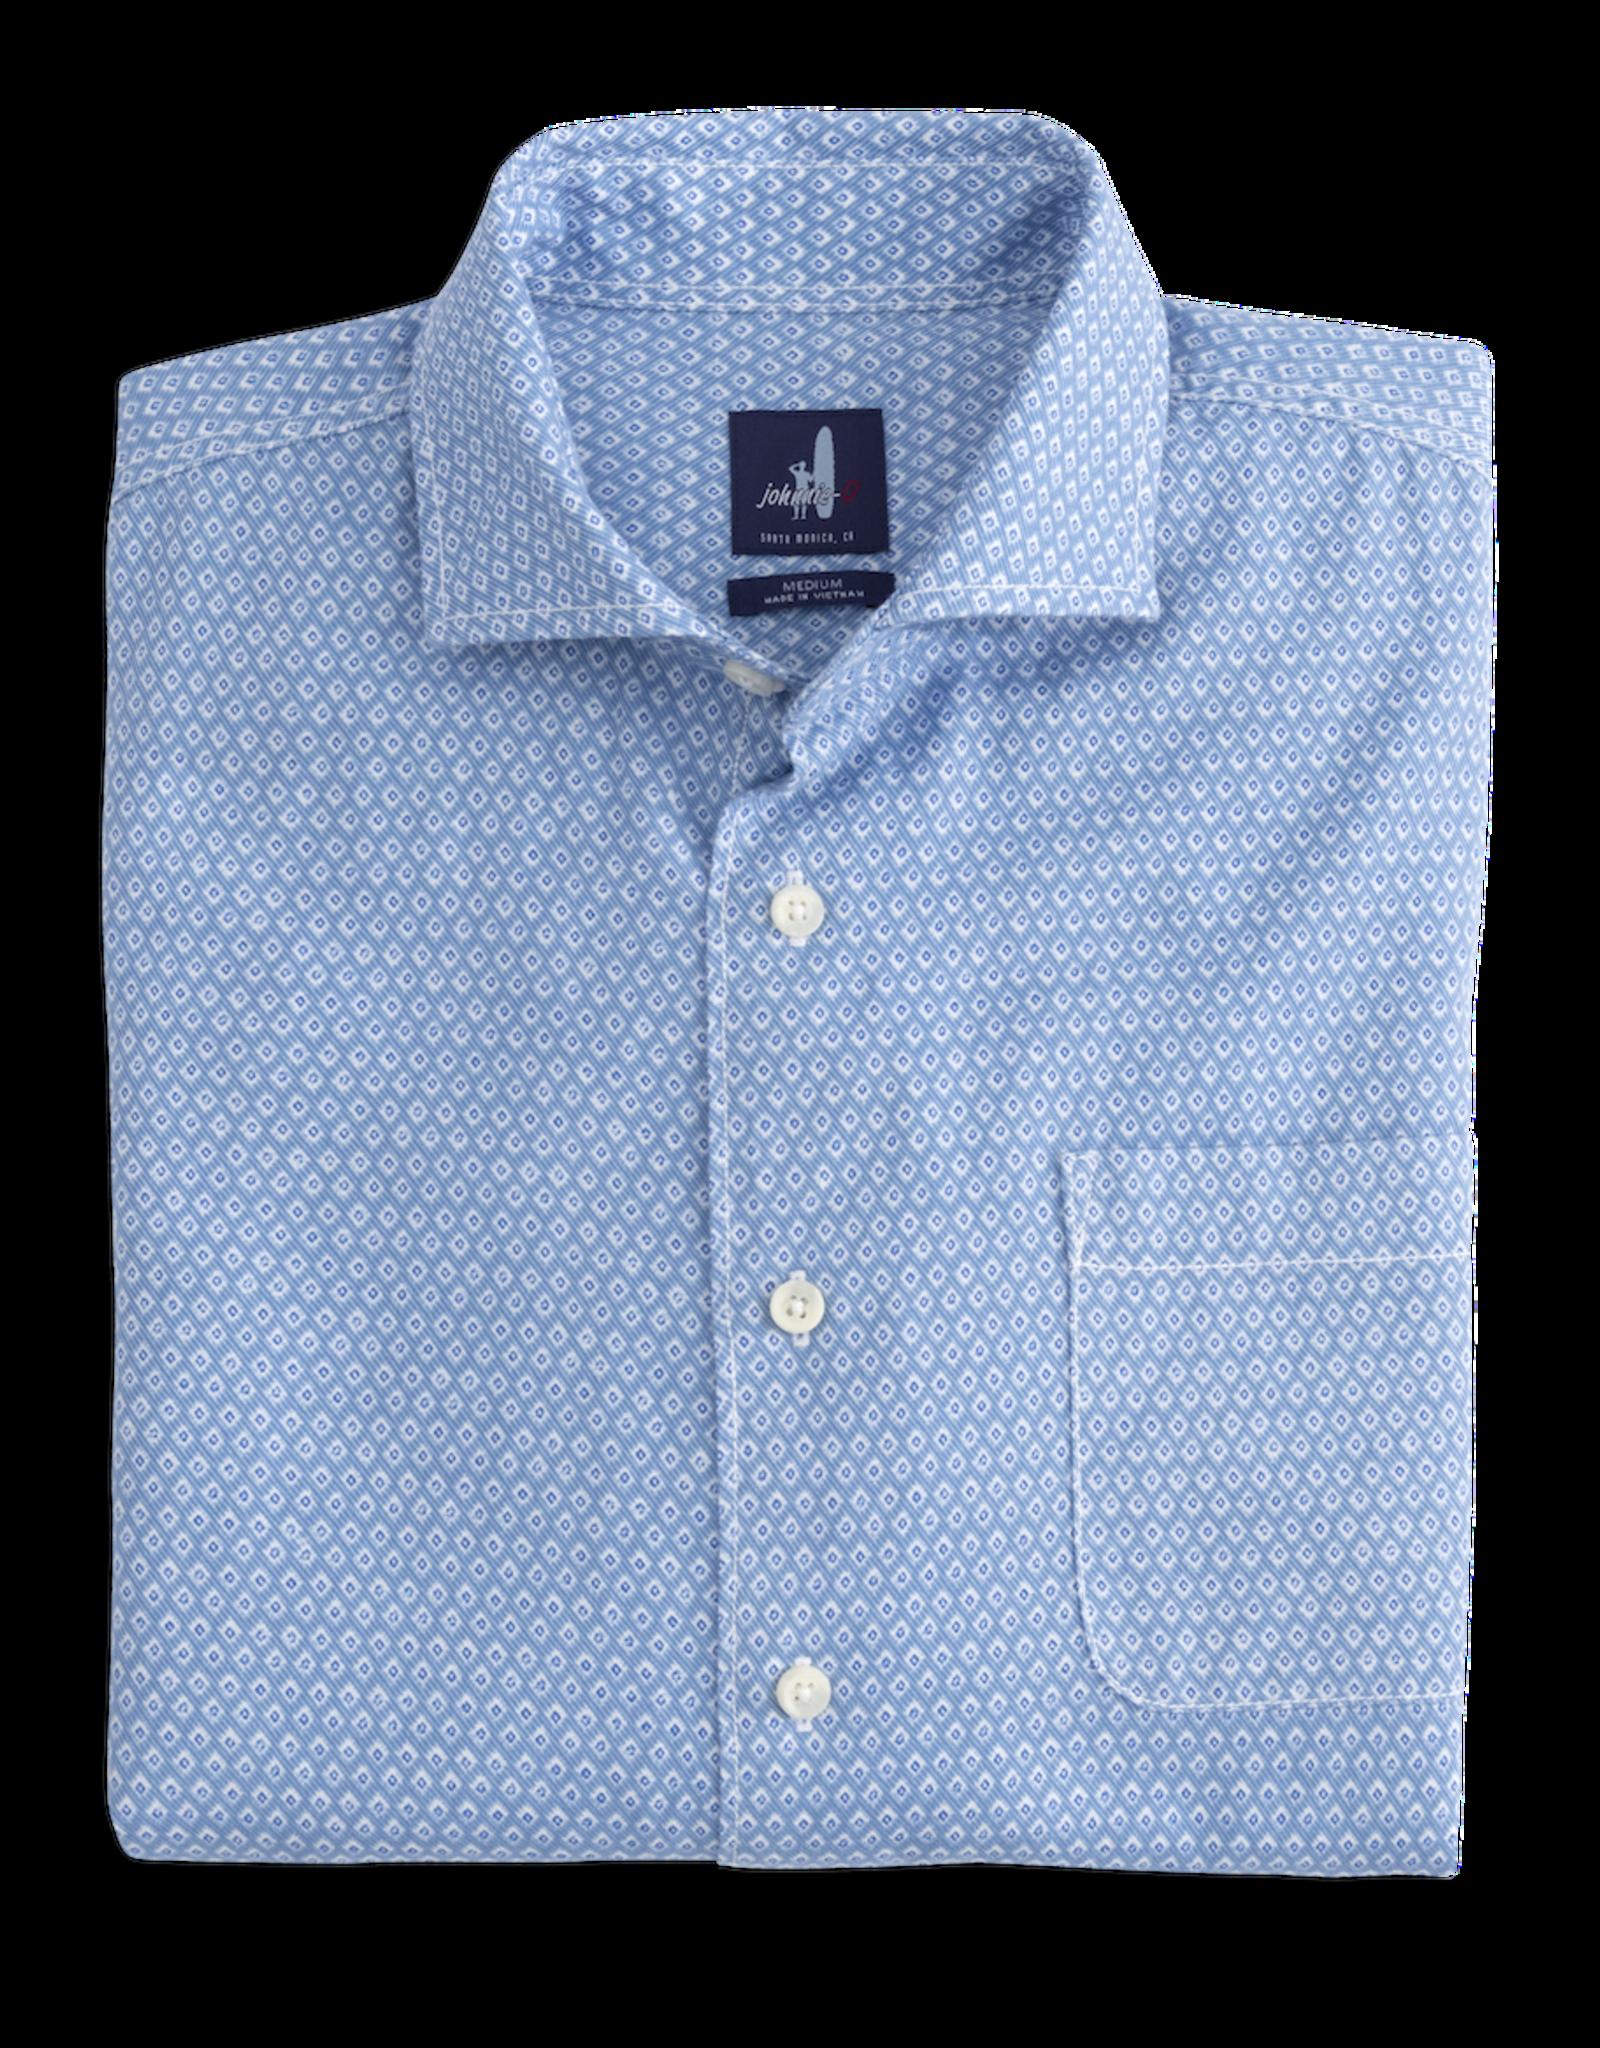 Johnnie-O Harry Shirt